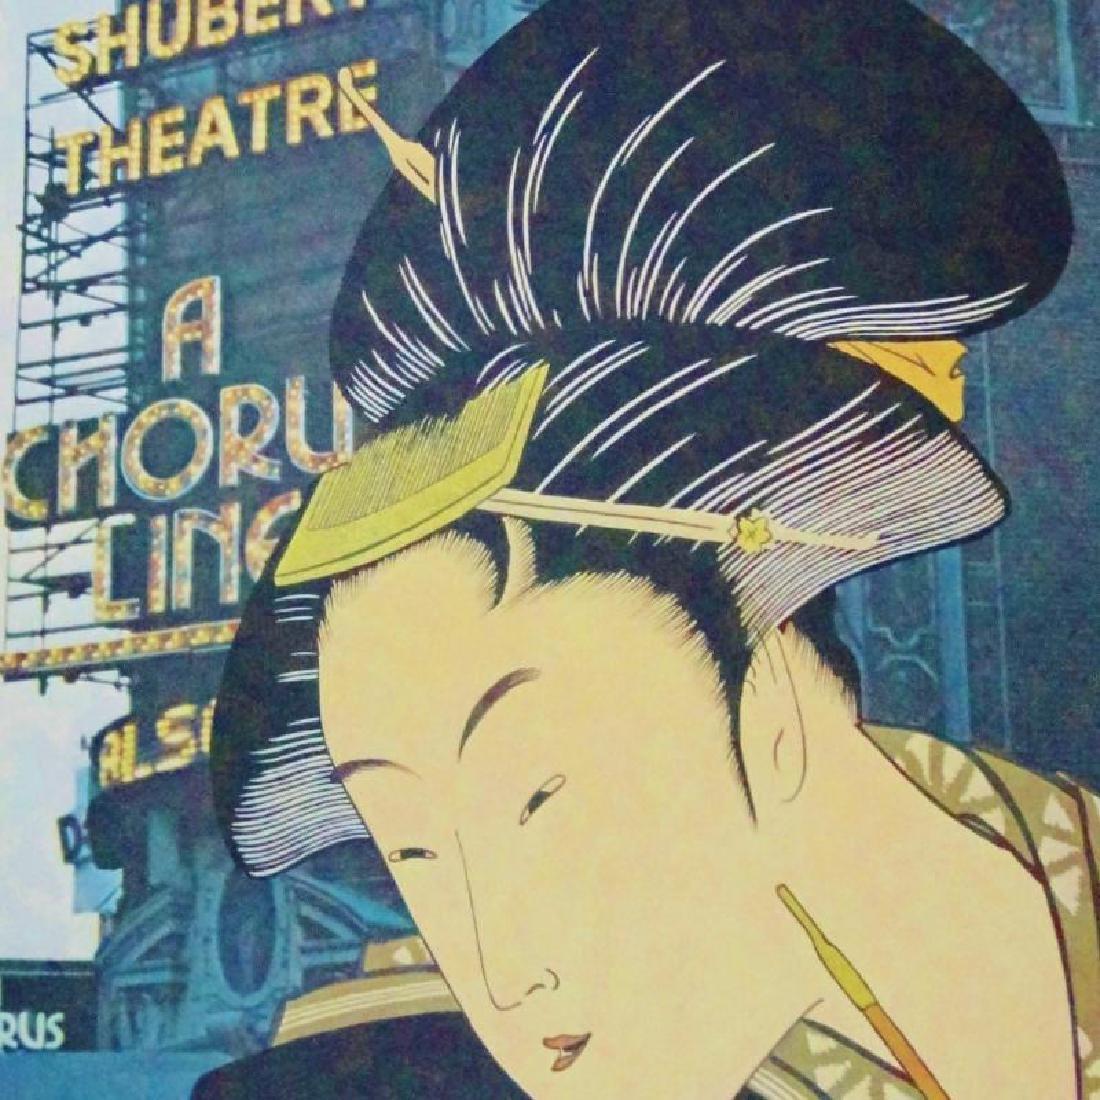 Shubert Theatre Utamaro Suite Litho Colorful Sale - 2